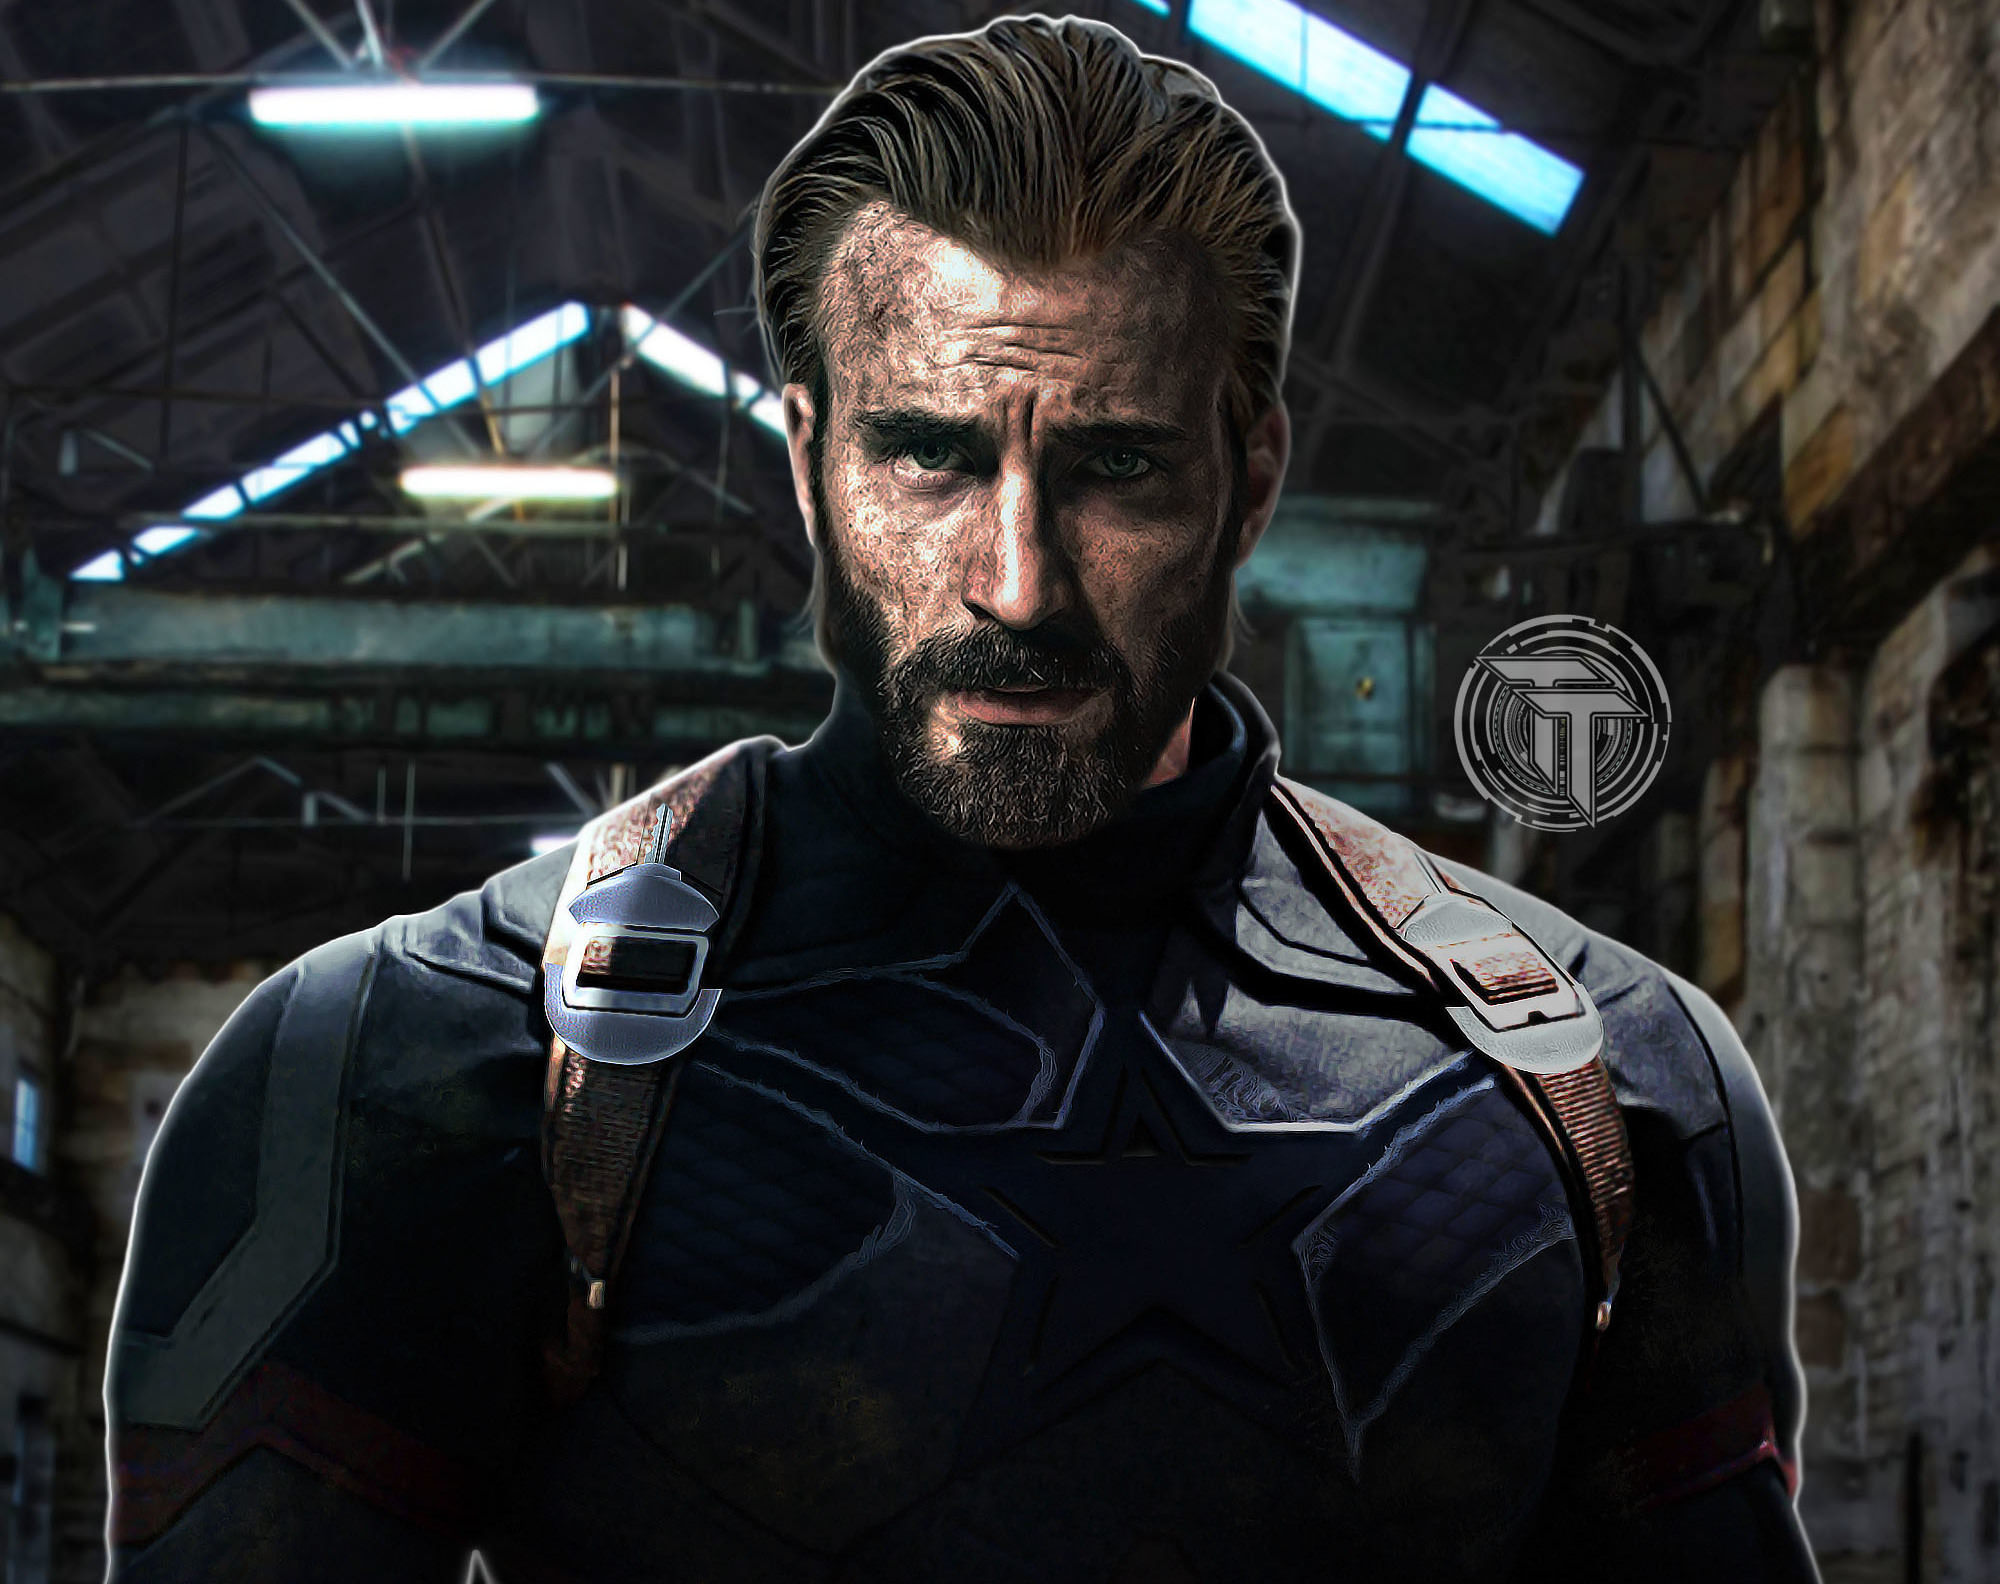 1920x1080 Captain America Beard Look In Infinity War 1080P Laptop 2000x1584